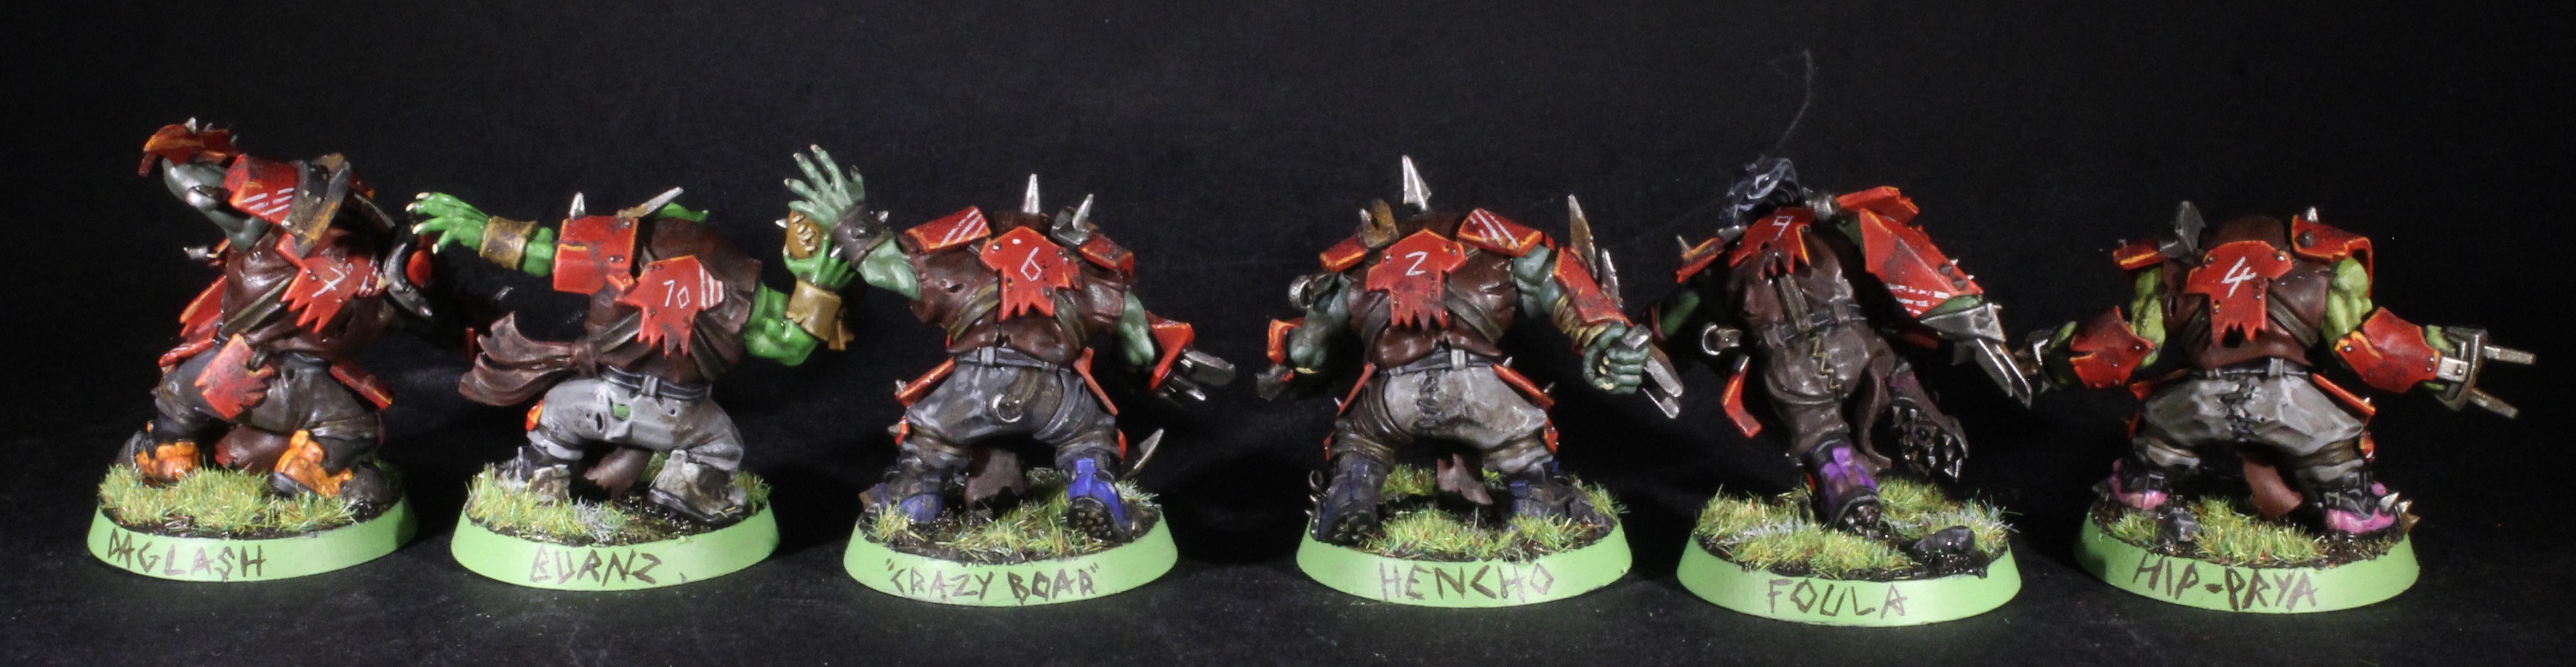 blood bowl orc team names